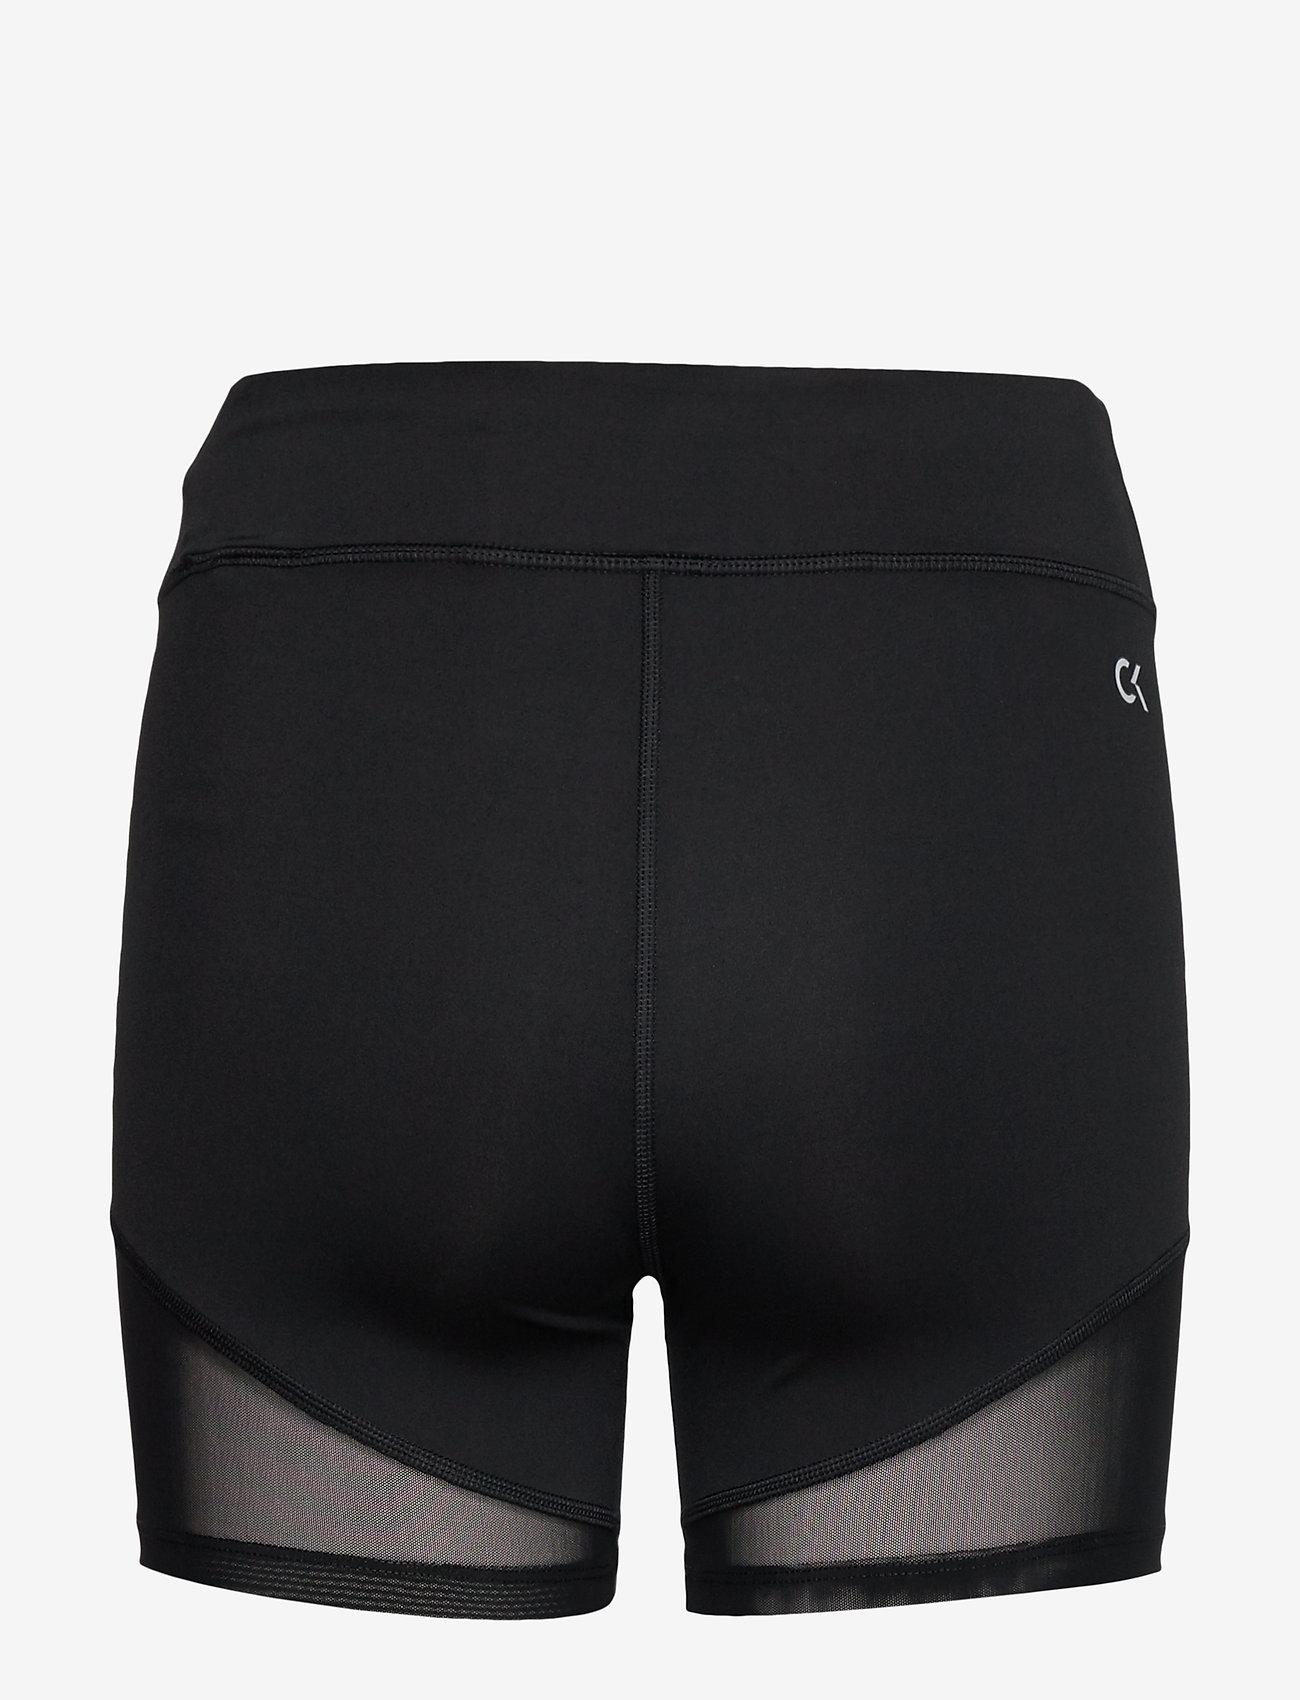 "Calvin Klein Performance - 2.5"" TIGHT SHORT - spodenki treningowe - ck black - 1"